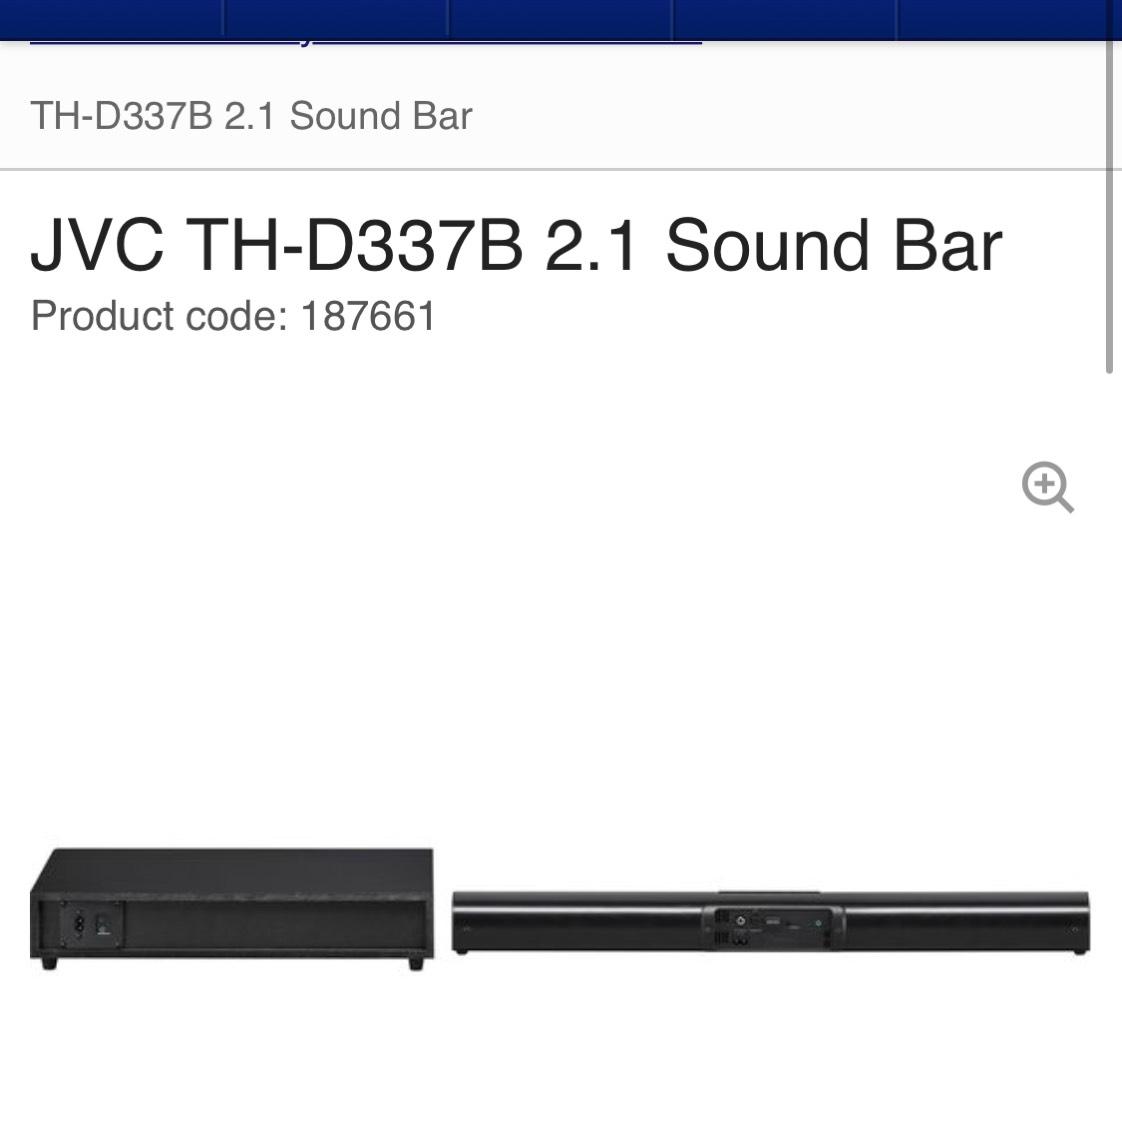 Jvc sound bar & subwoofer £79.99 @ Currys /pc world